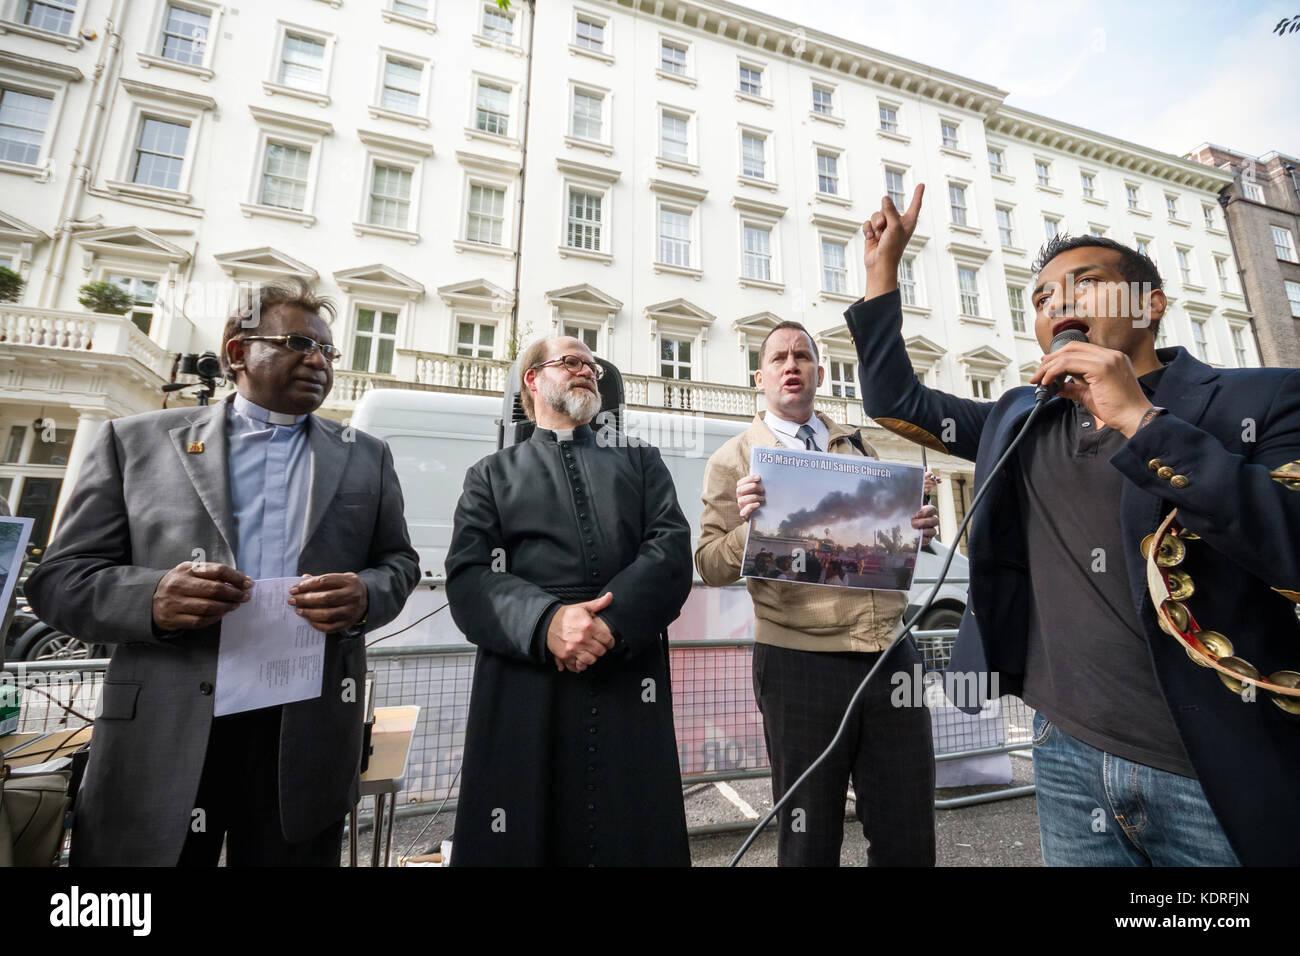 British Pakistani Christians protest outside High Commission of Pakistan in London, UK. - Stock Image